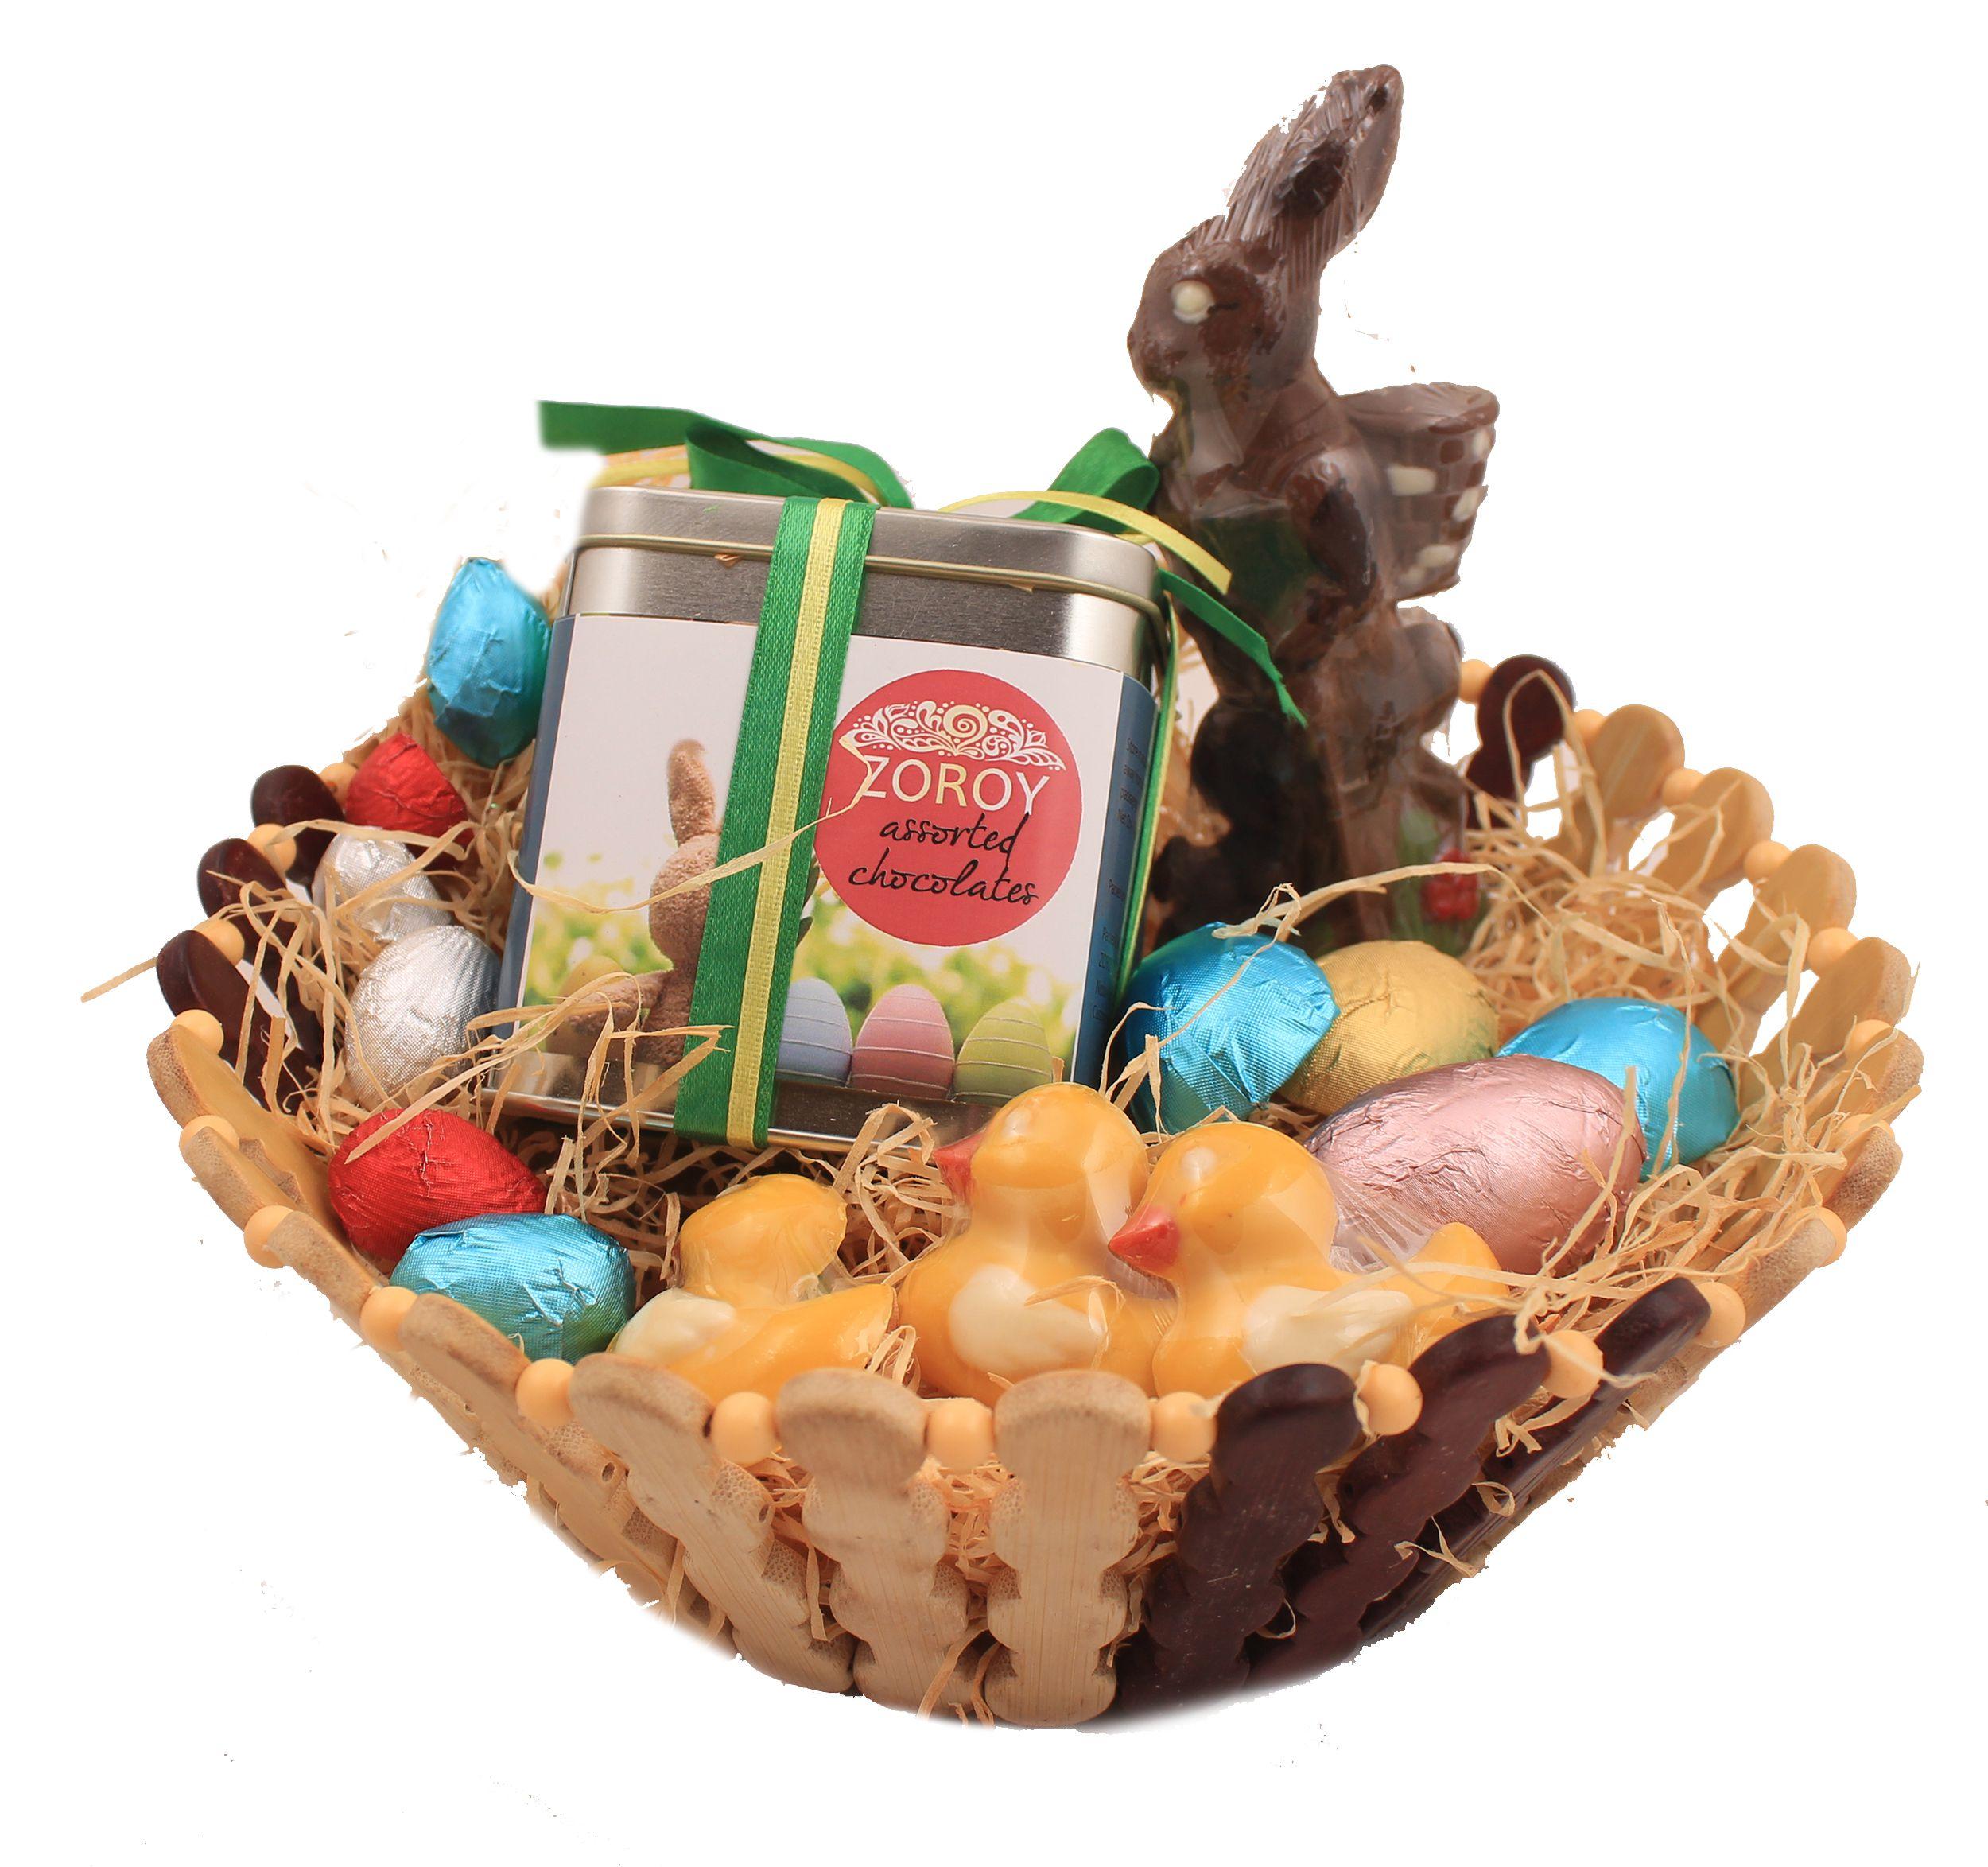 Zoroy Luxury Chocolate Easter Chocolates Assorted Basket 500 gm